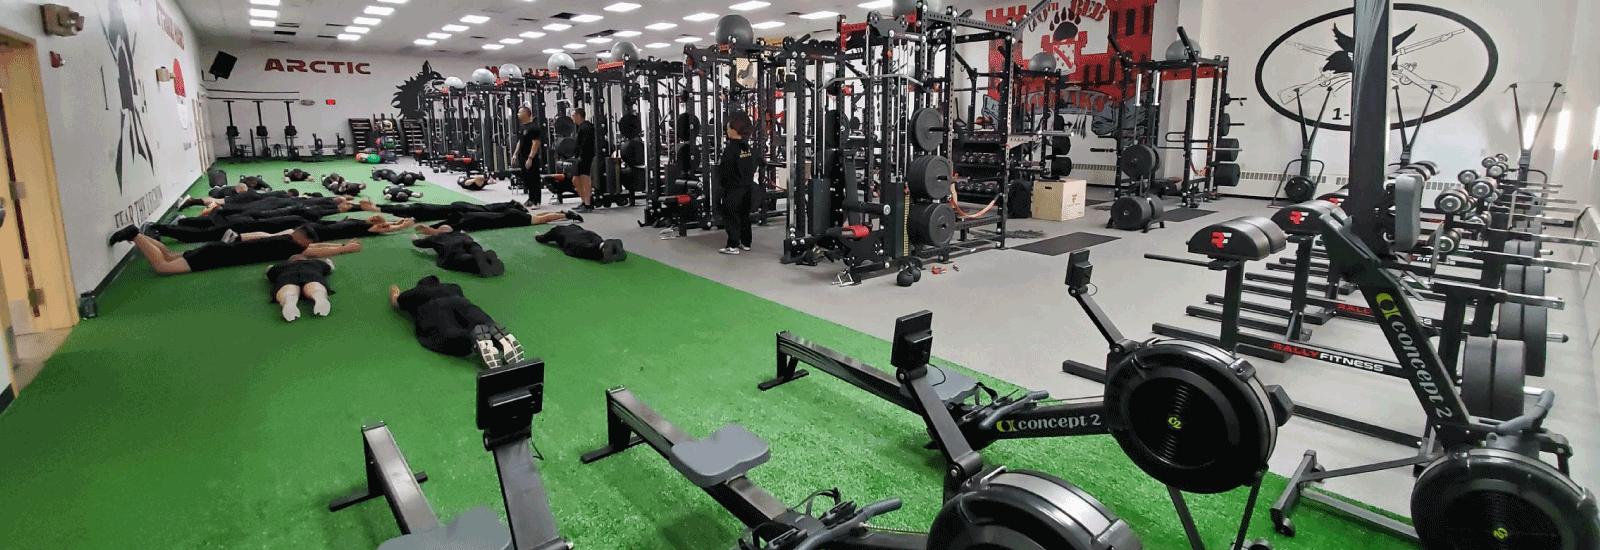 Fort Wainwright Gym